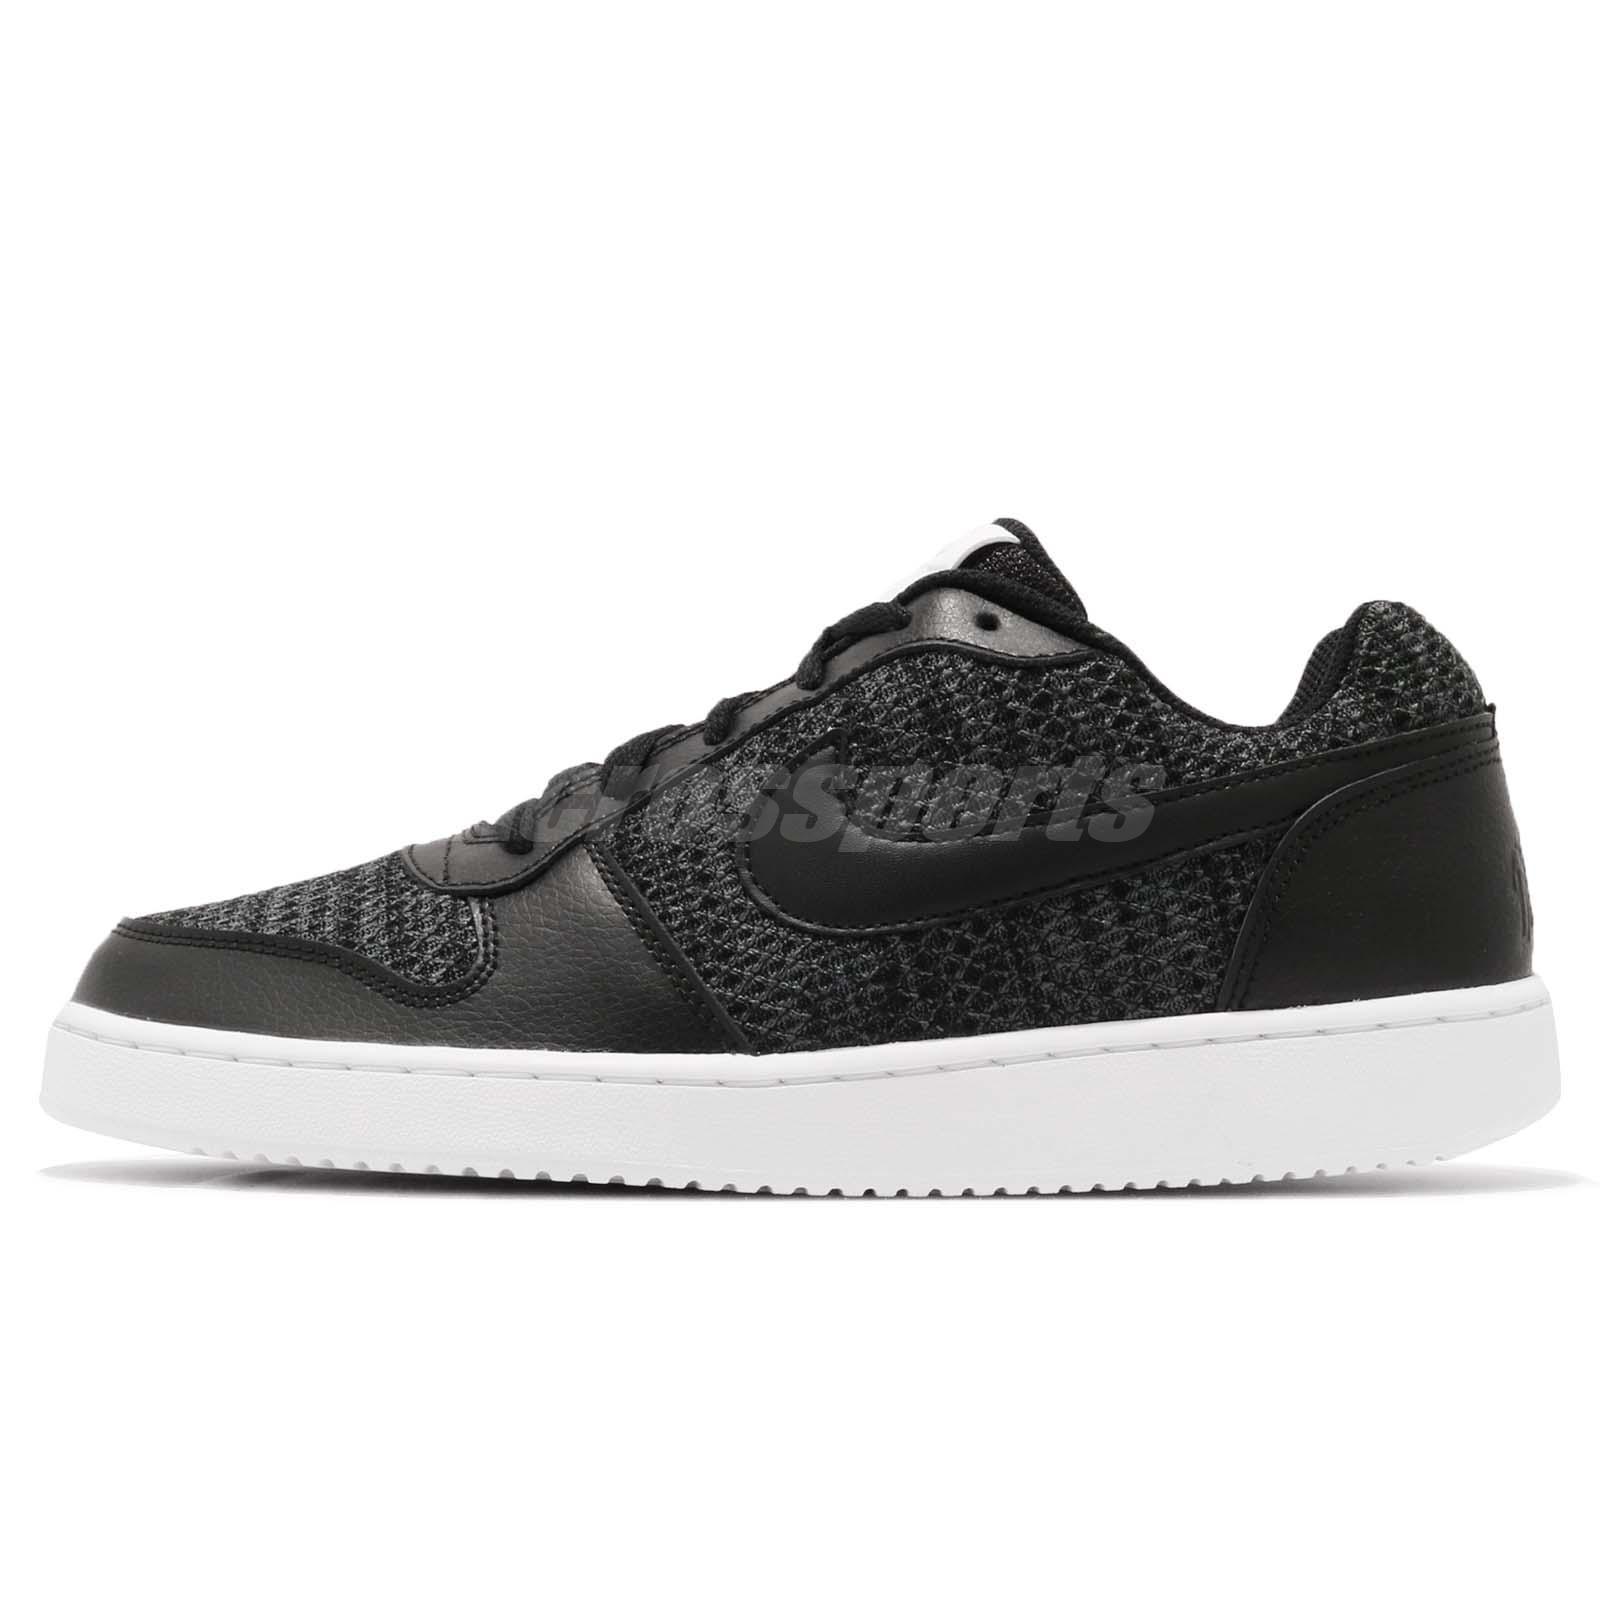 the best attitude 896a6 6dd7f Nike Ebernon Low PREM Premium Black White Men Casual Shoes Sneakers AQ1774 -001